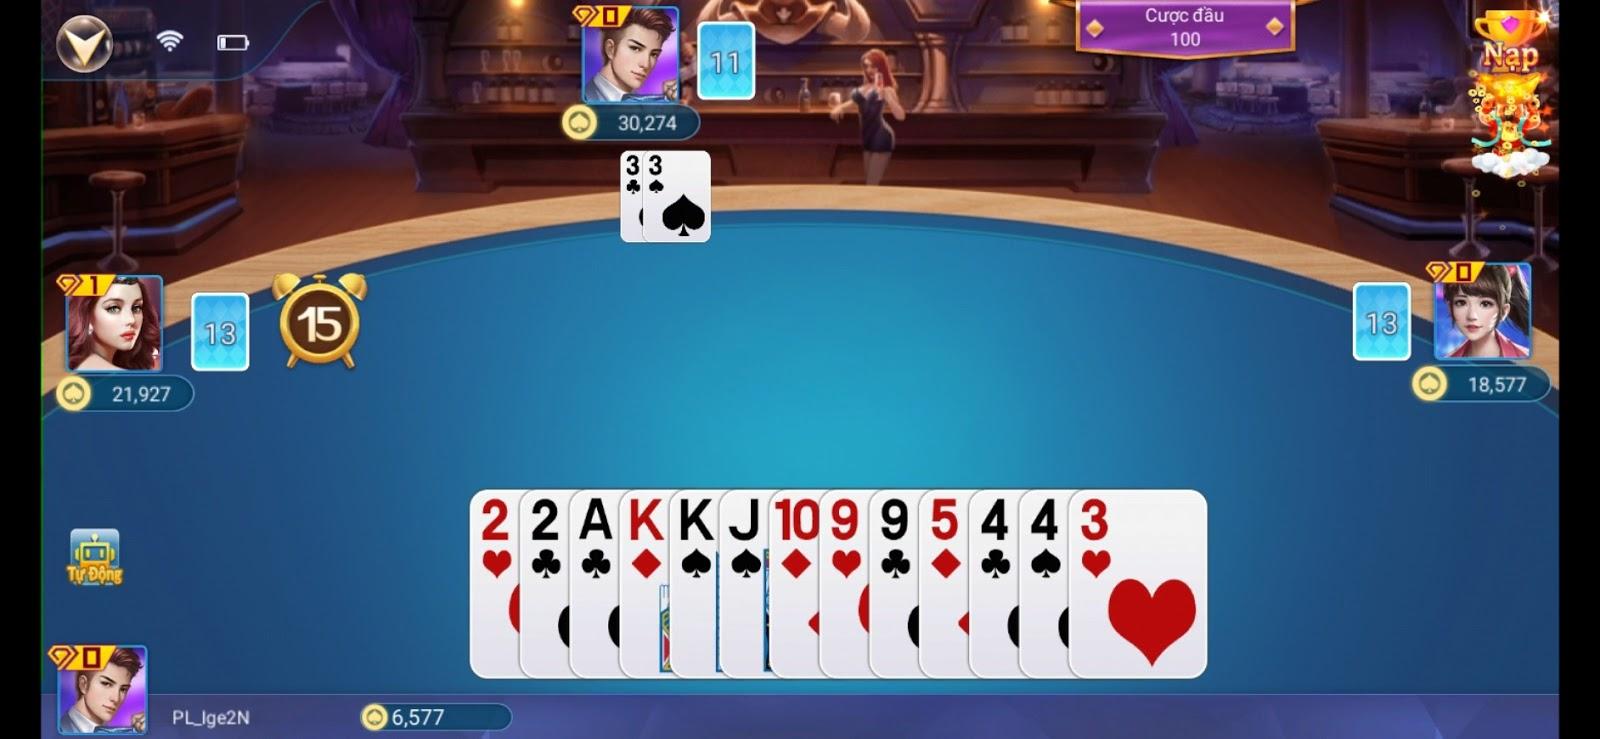 iwin, iwin68, tải iwin, game iwin, game đánh bài iwin đổi thưởng, iwin casino